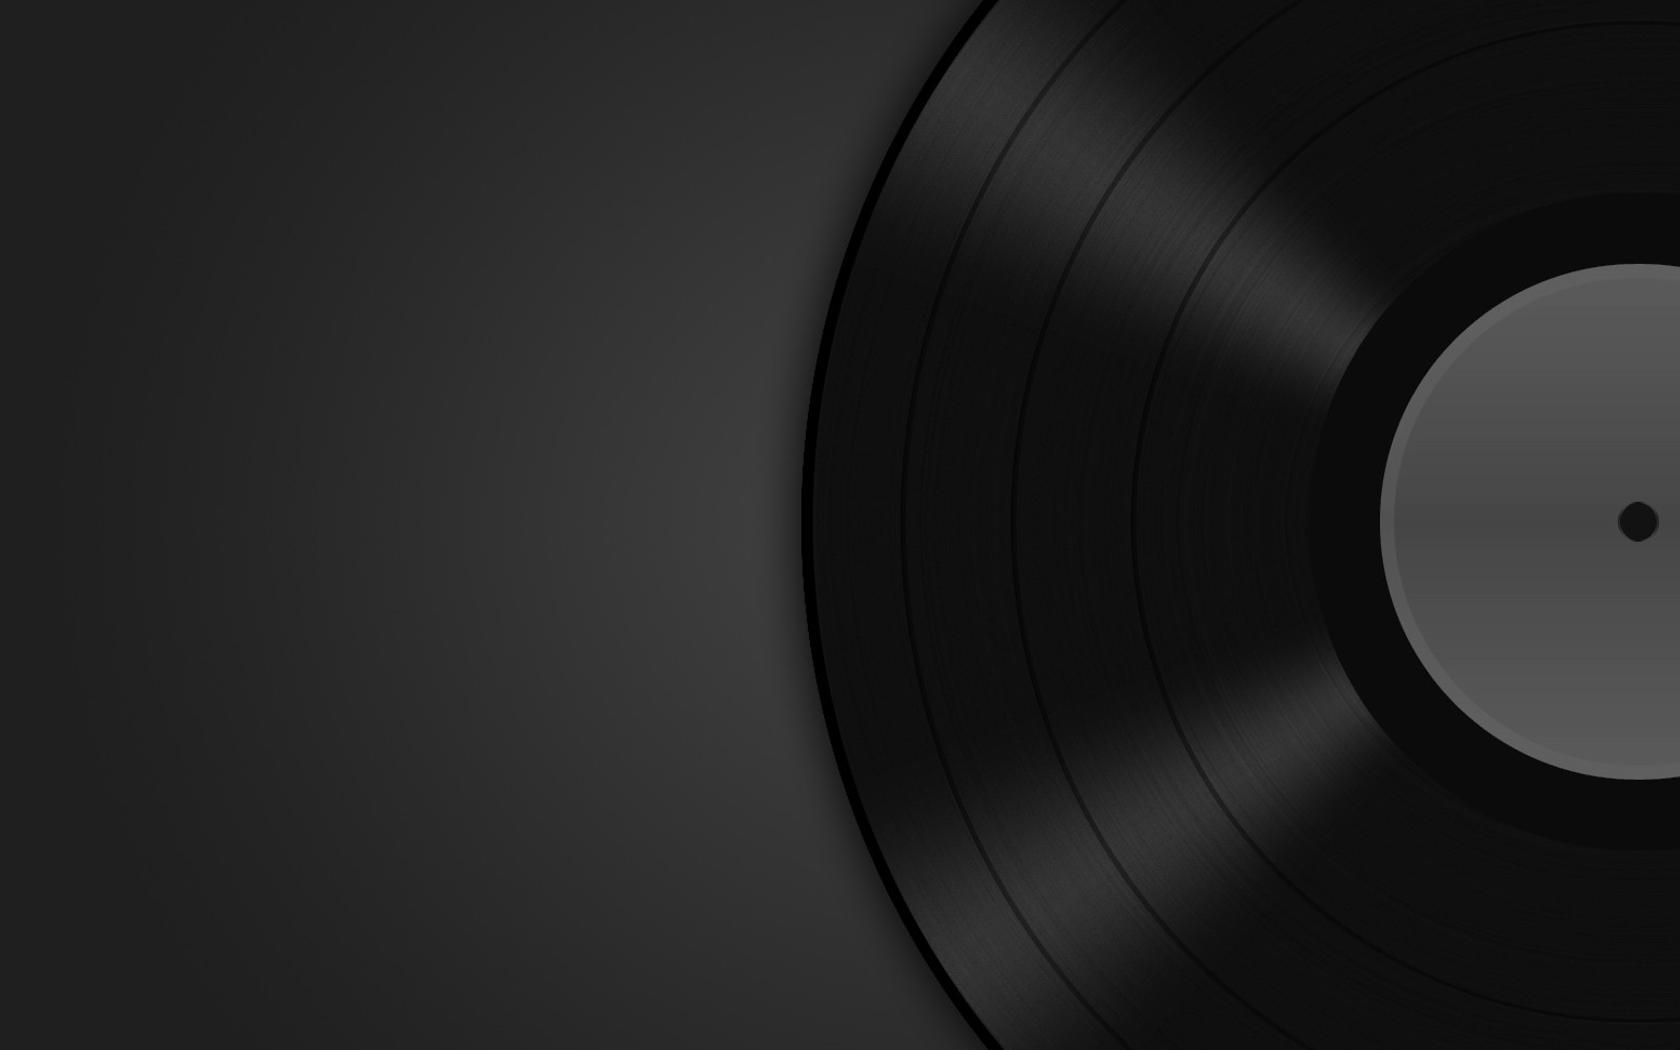 Music Desktop Wallpapers Wallpaper Cave